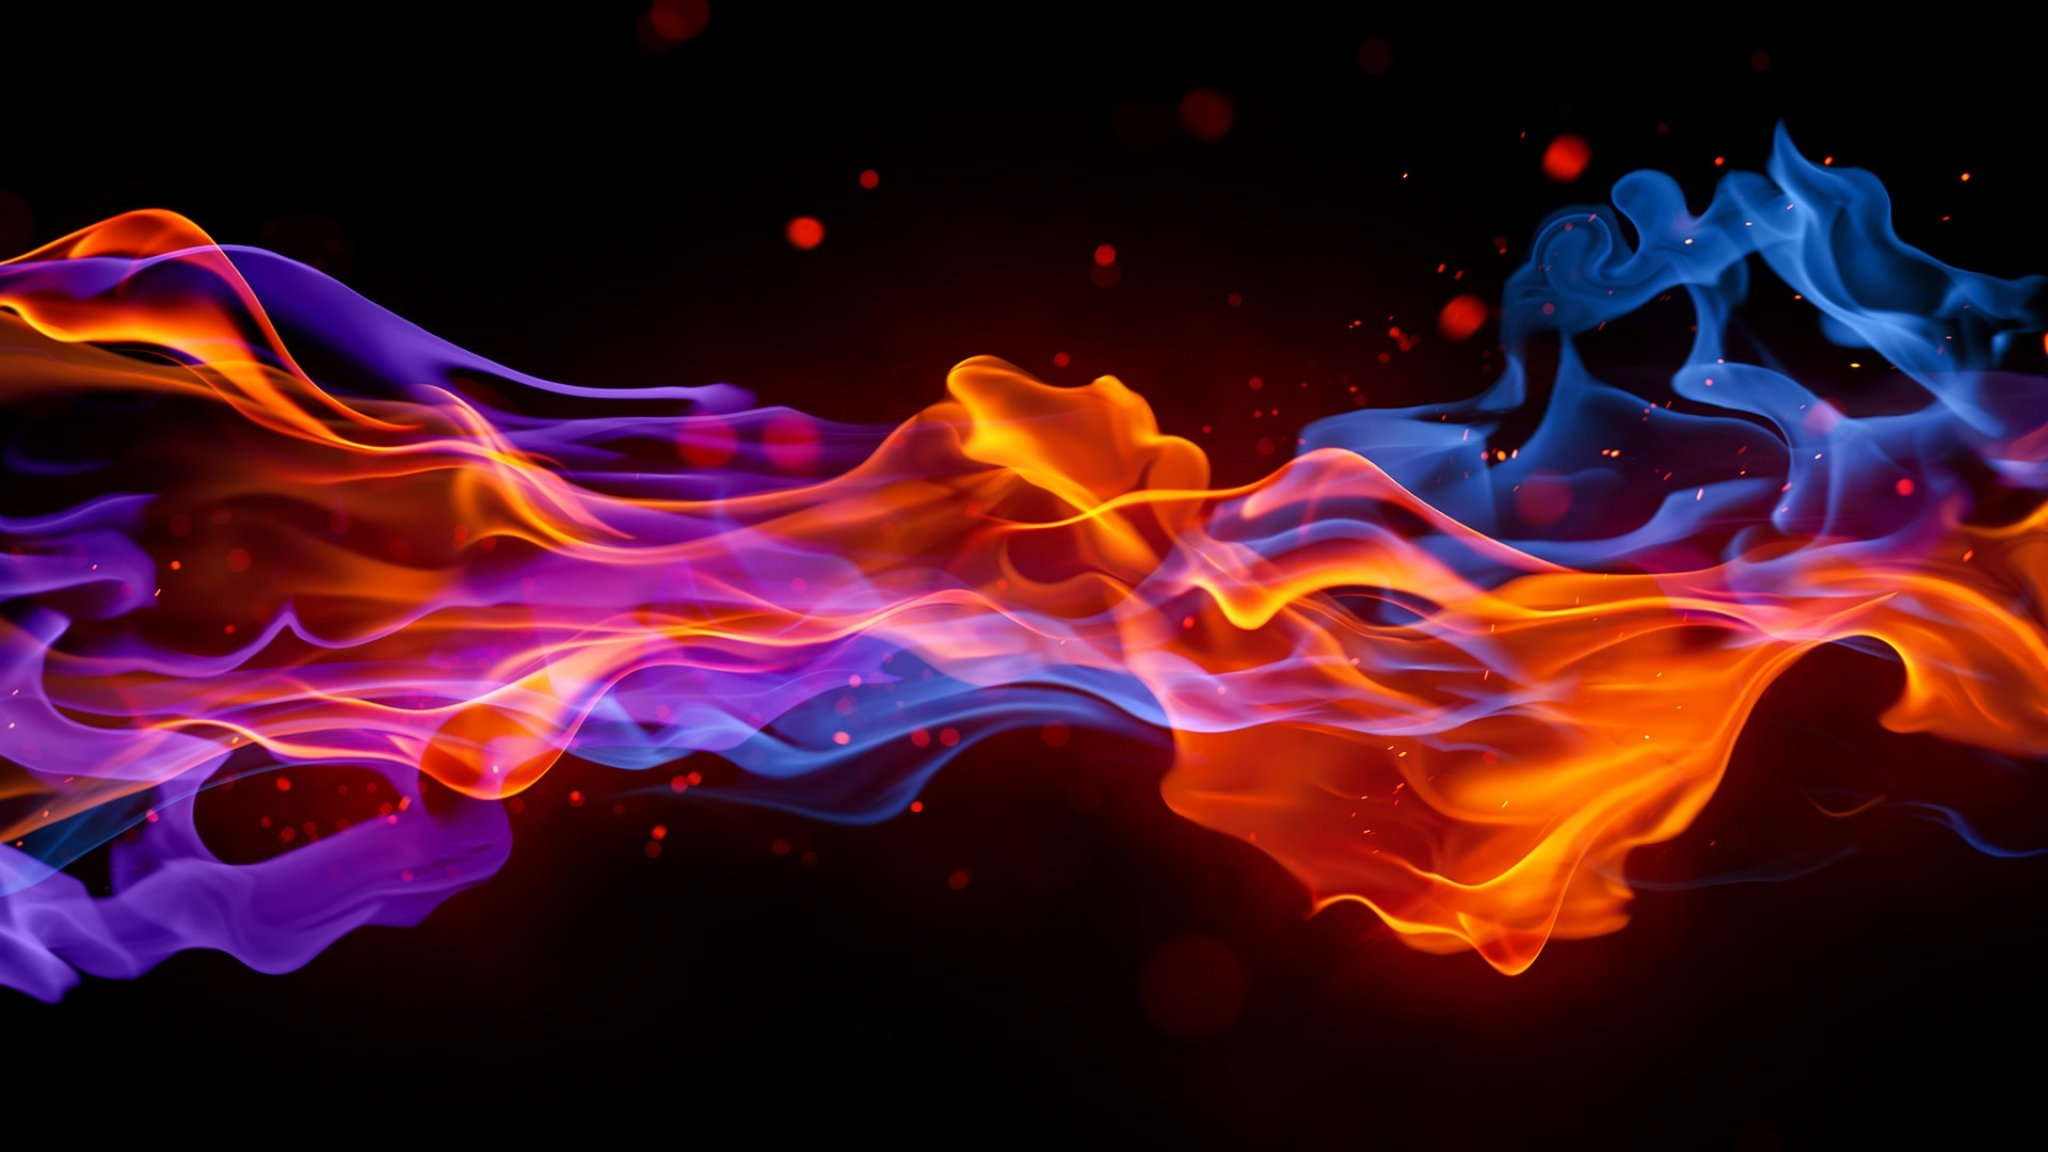 2048x1152 wallpaper free fire: 2048x1152 Wallpaper For YouTube